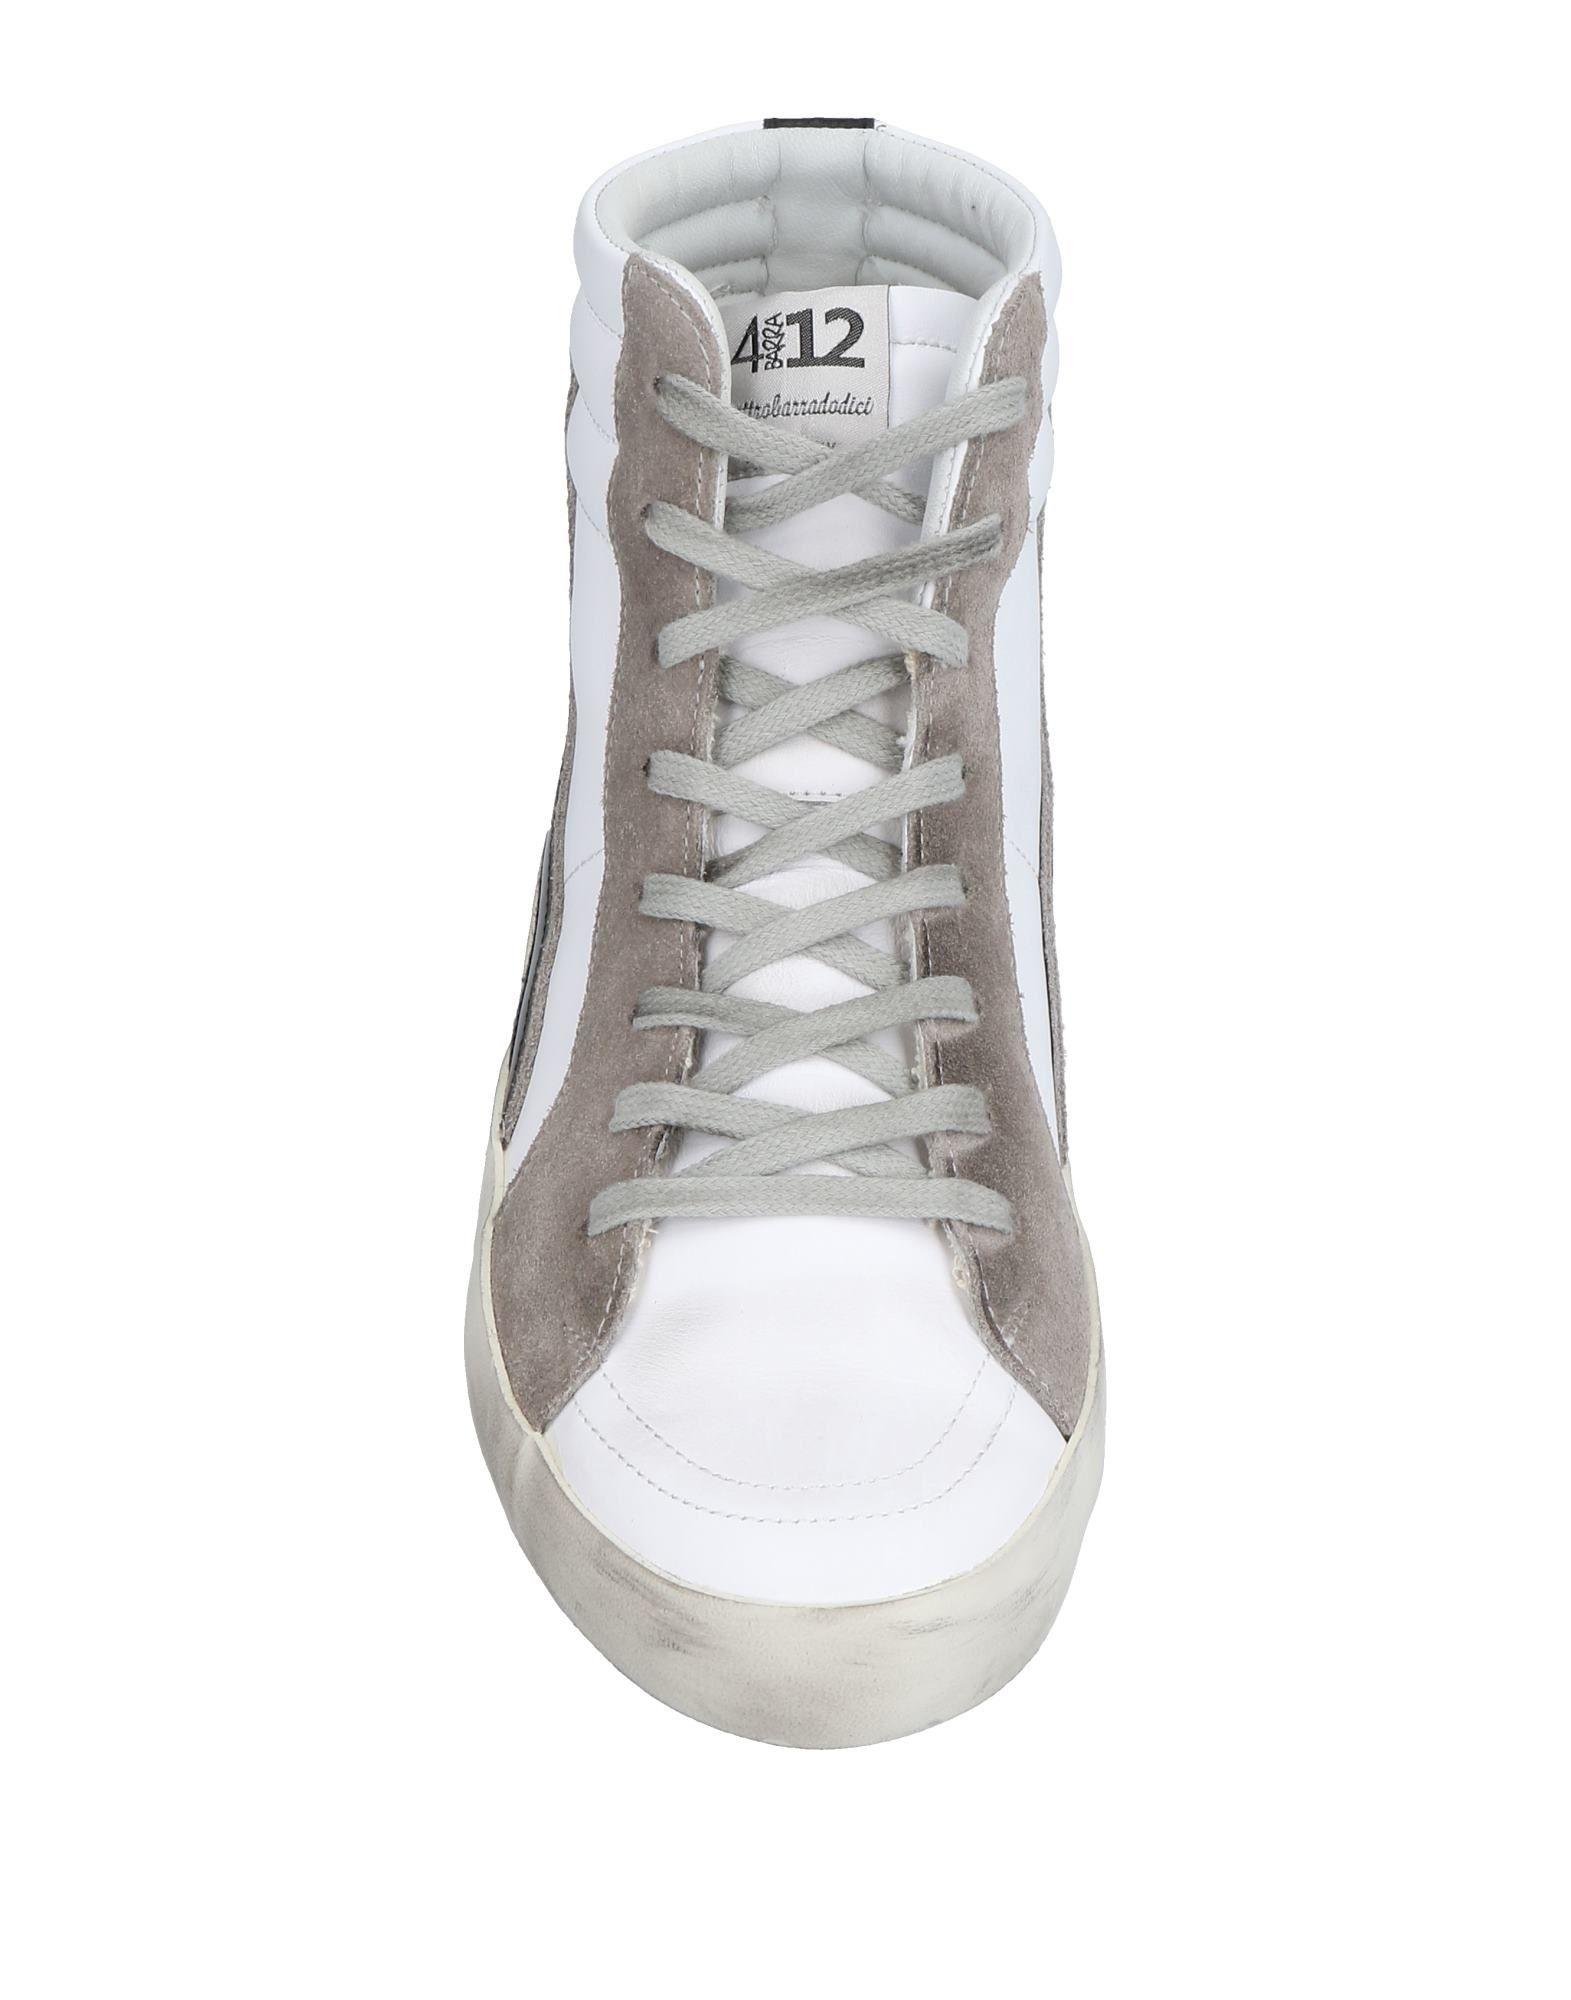 Quattrobarradodici Sneakers Gute Damen  11474145CW Gute Sneakers Qualität beliebte Schuhe 27e167